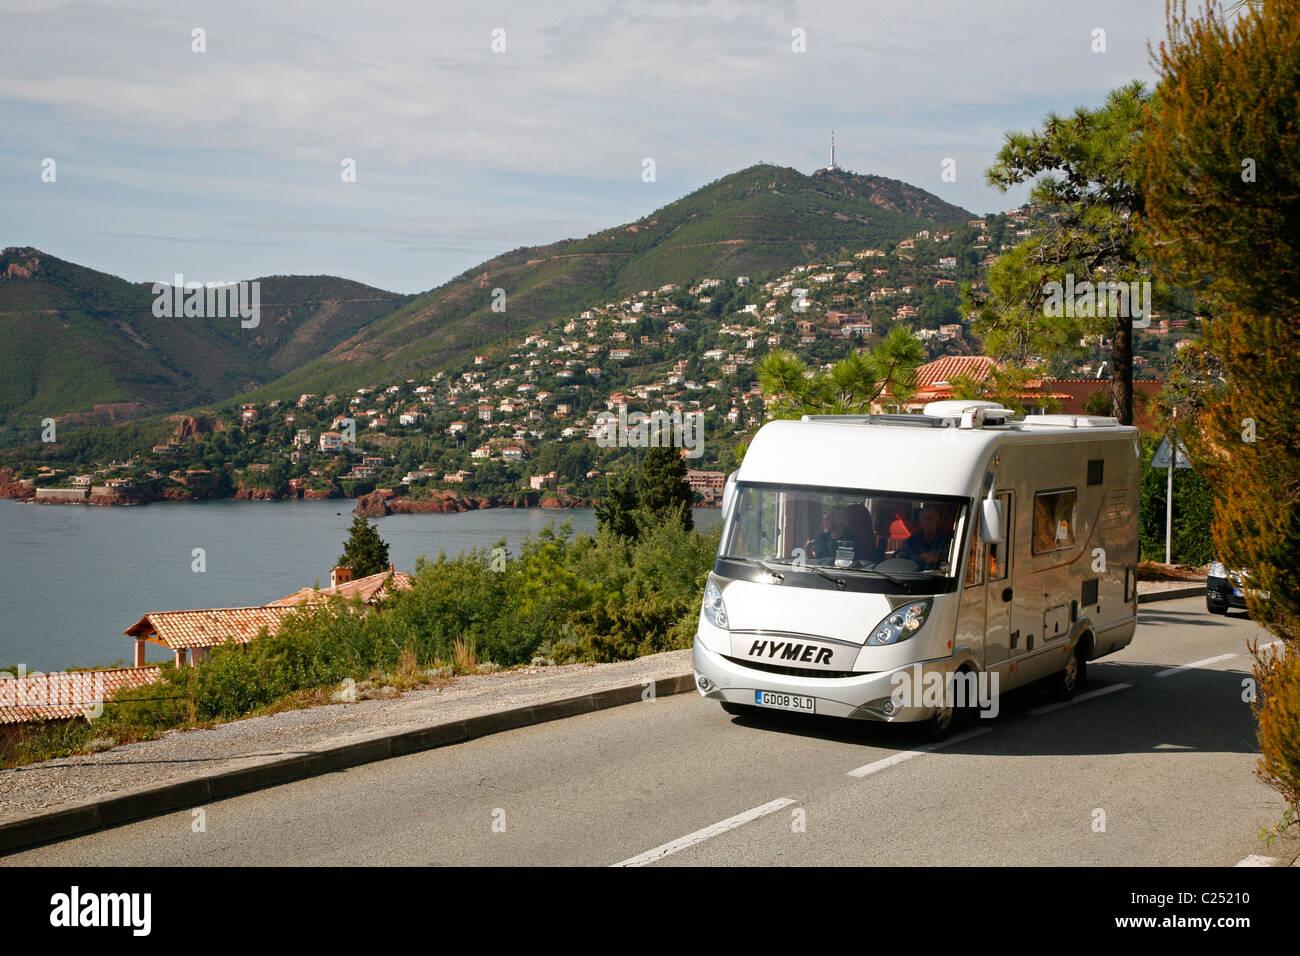 Camper van driving along the Esterel coast road, Var, Provence, France. - Stock Image